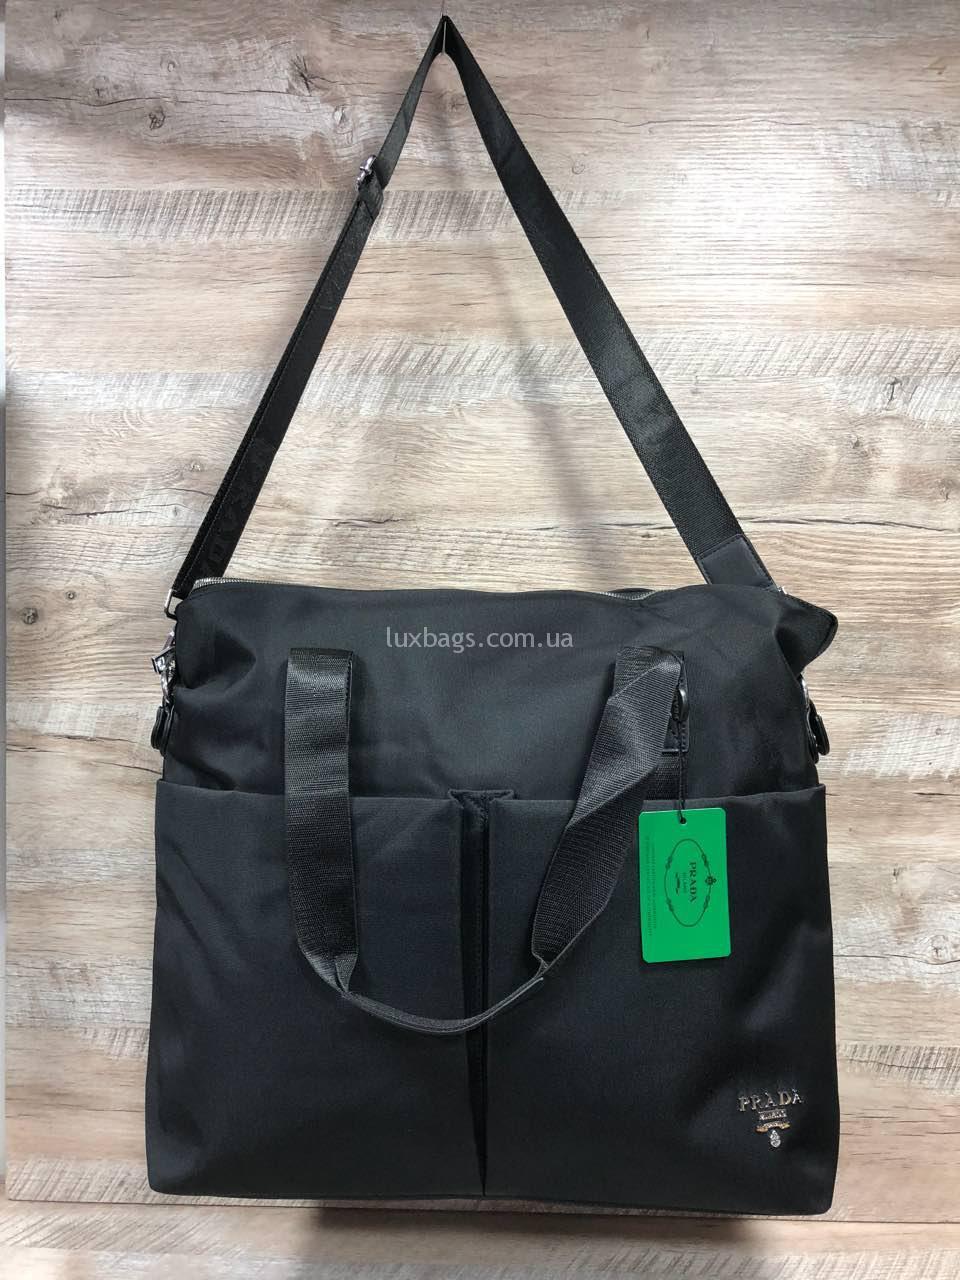 81be1cecbb91 Большая сумка Prada Прада черная женская фото